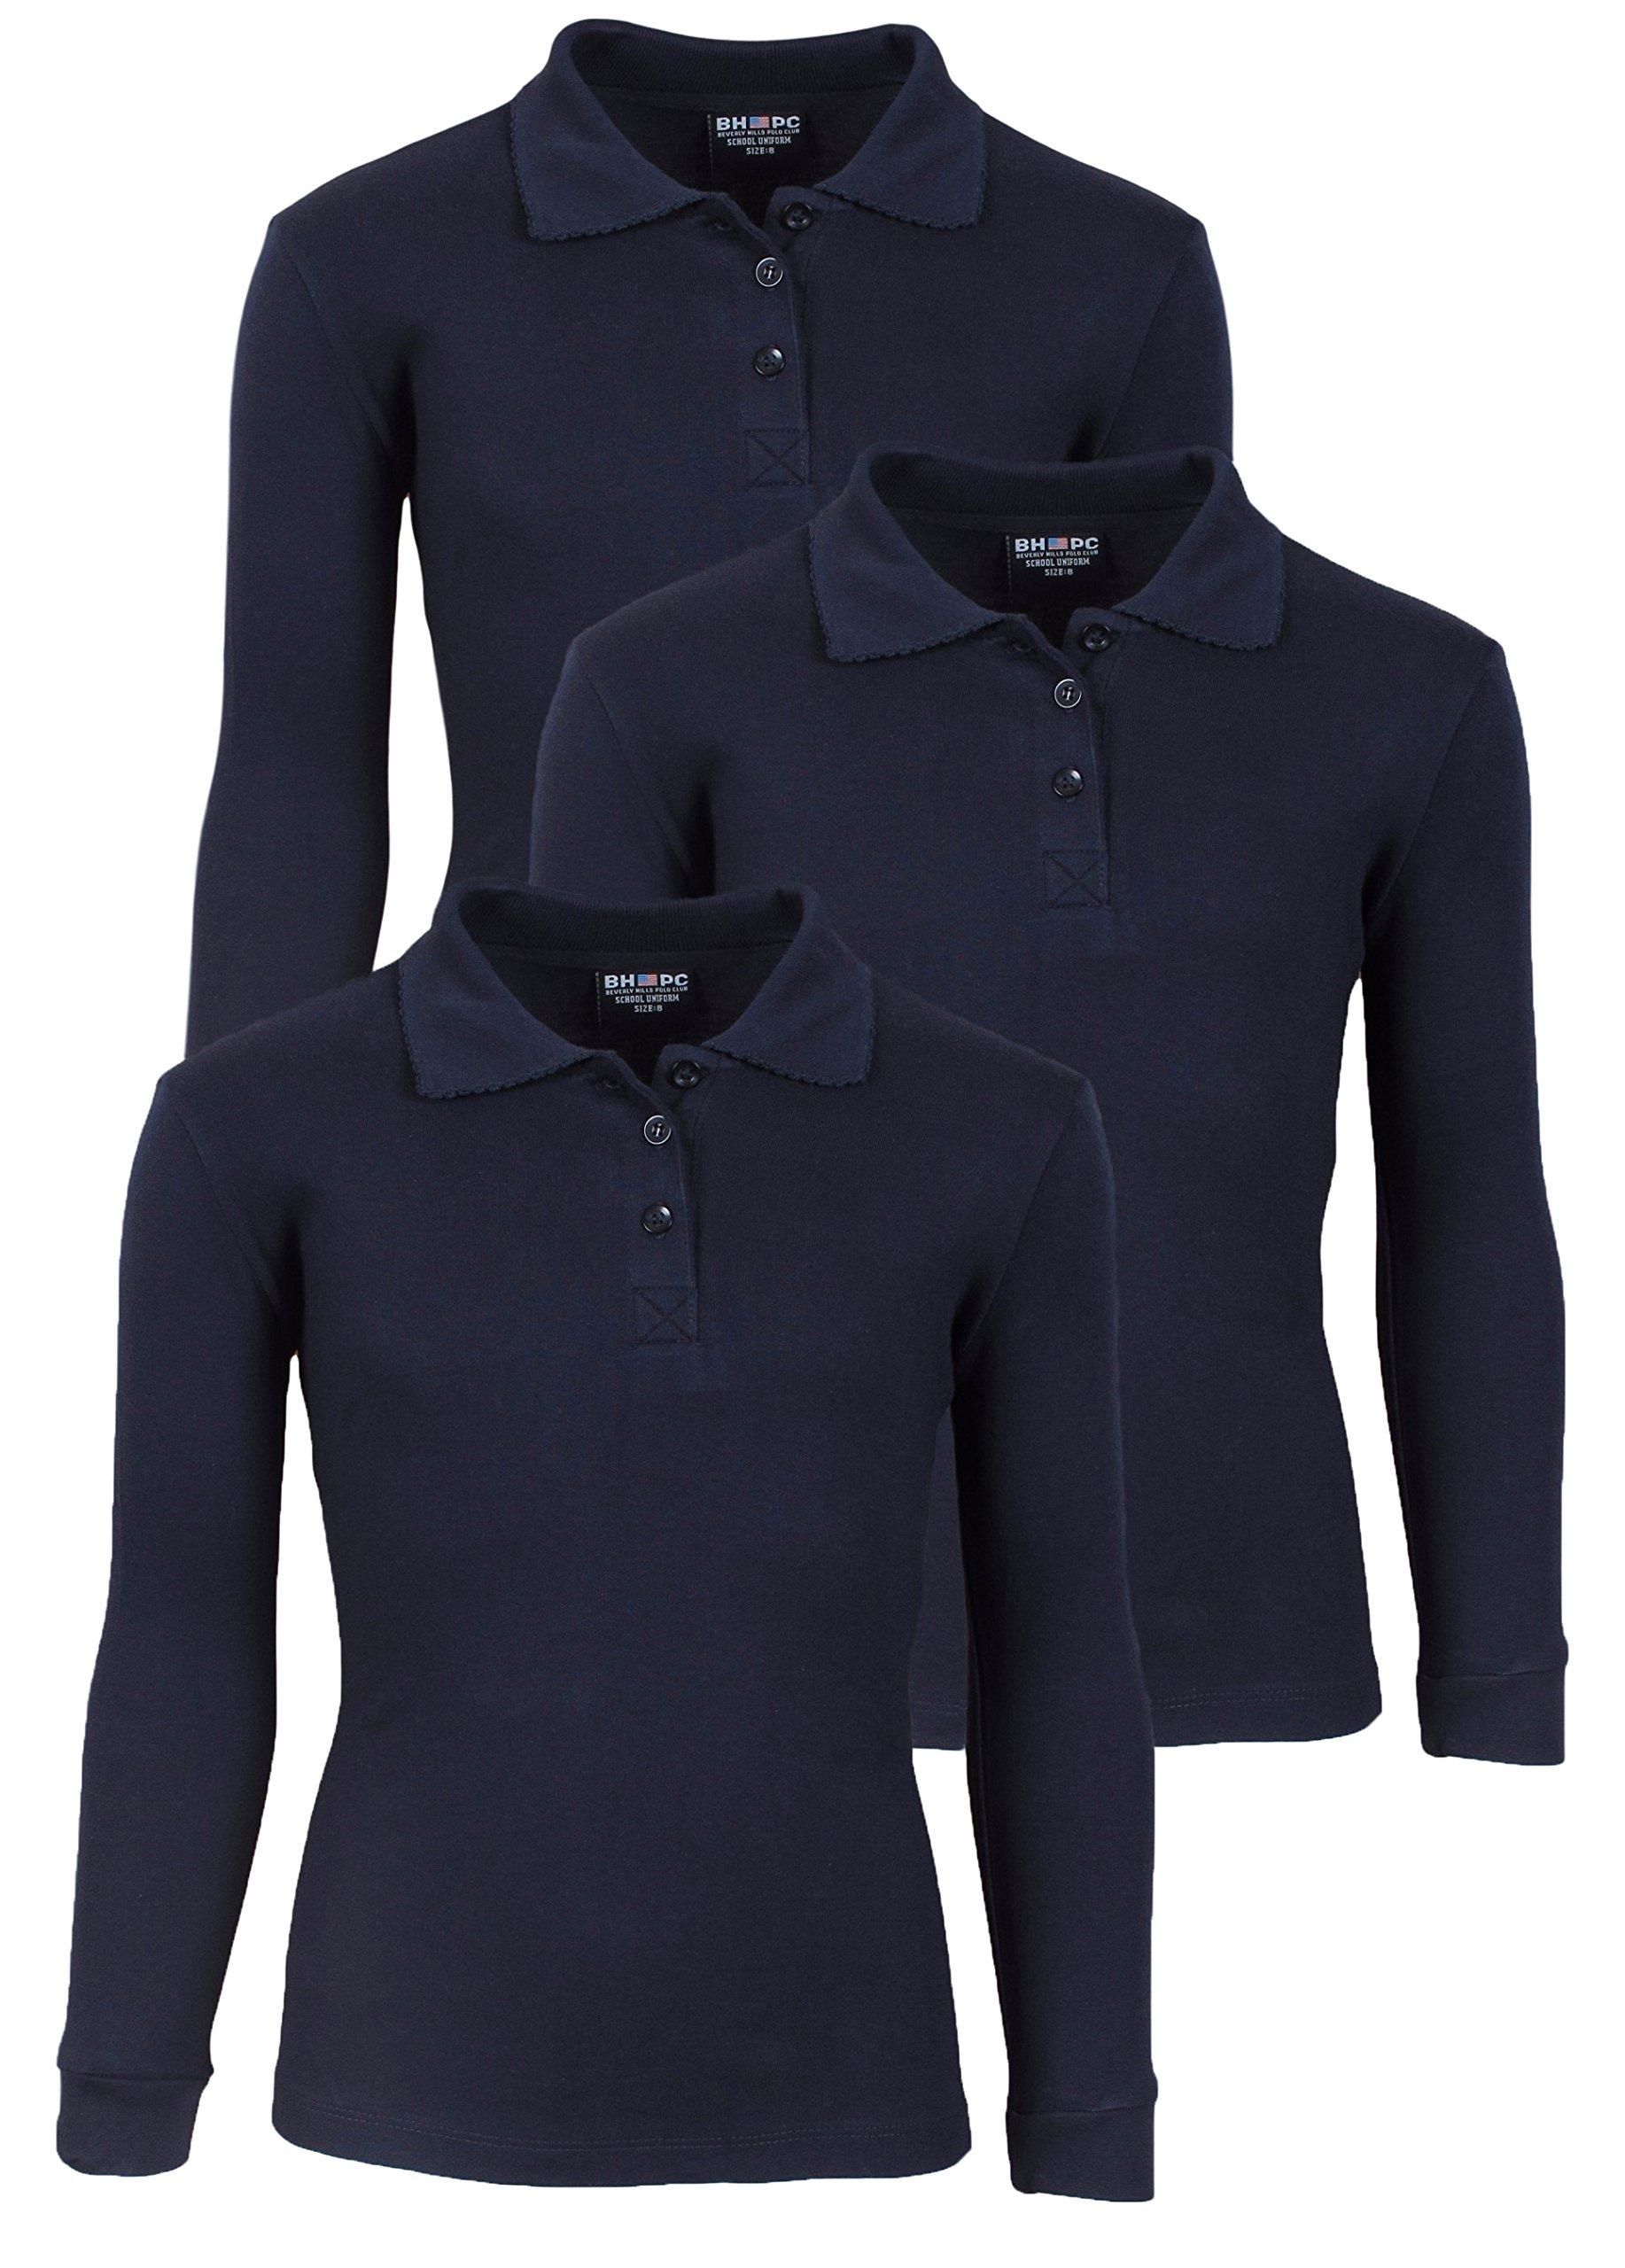 'Beverly Hills Polo Club 3 Pack of Girls' Long Sleeve Interlock Uniform Polo Shirts, Size 10, Navy'